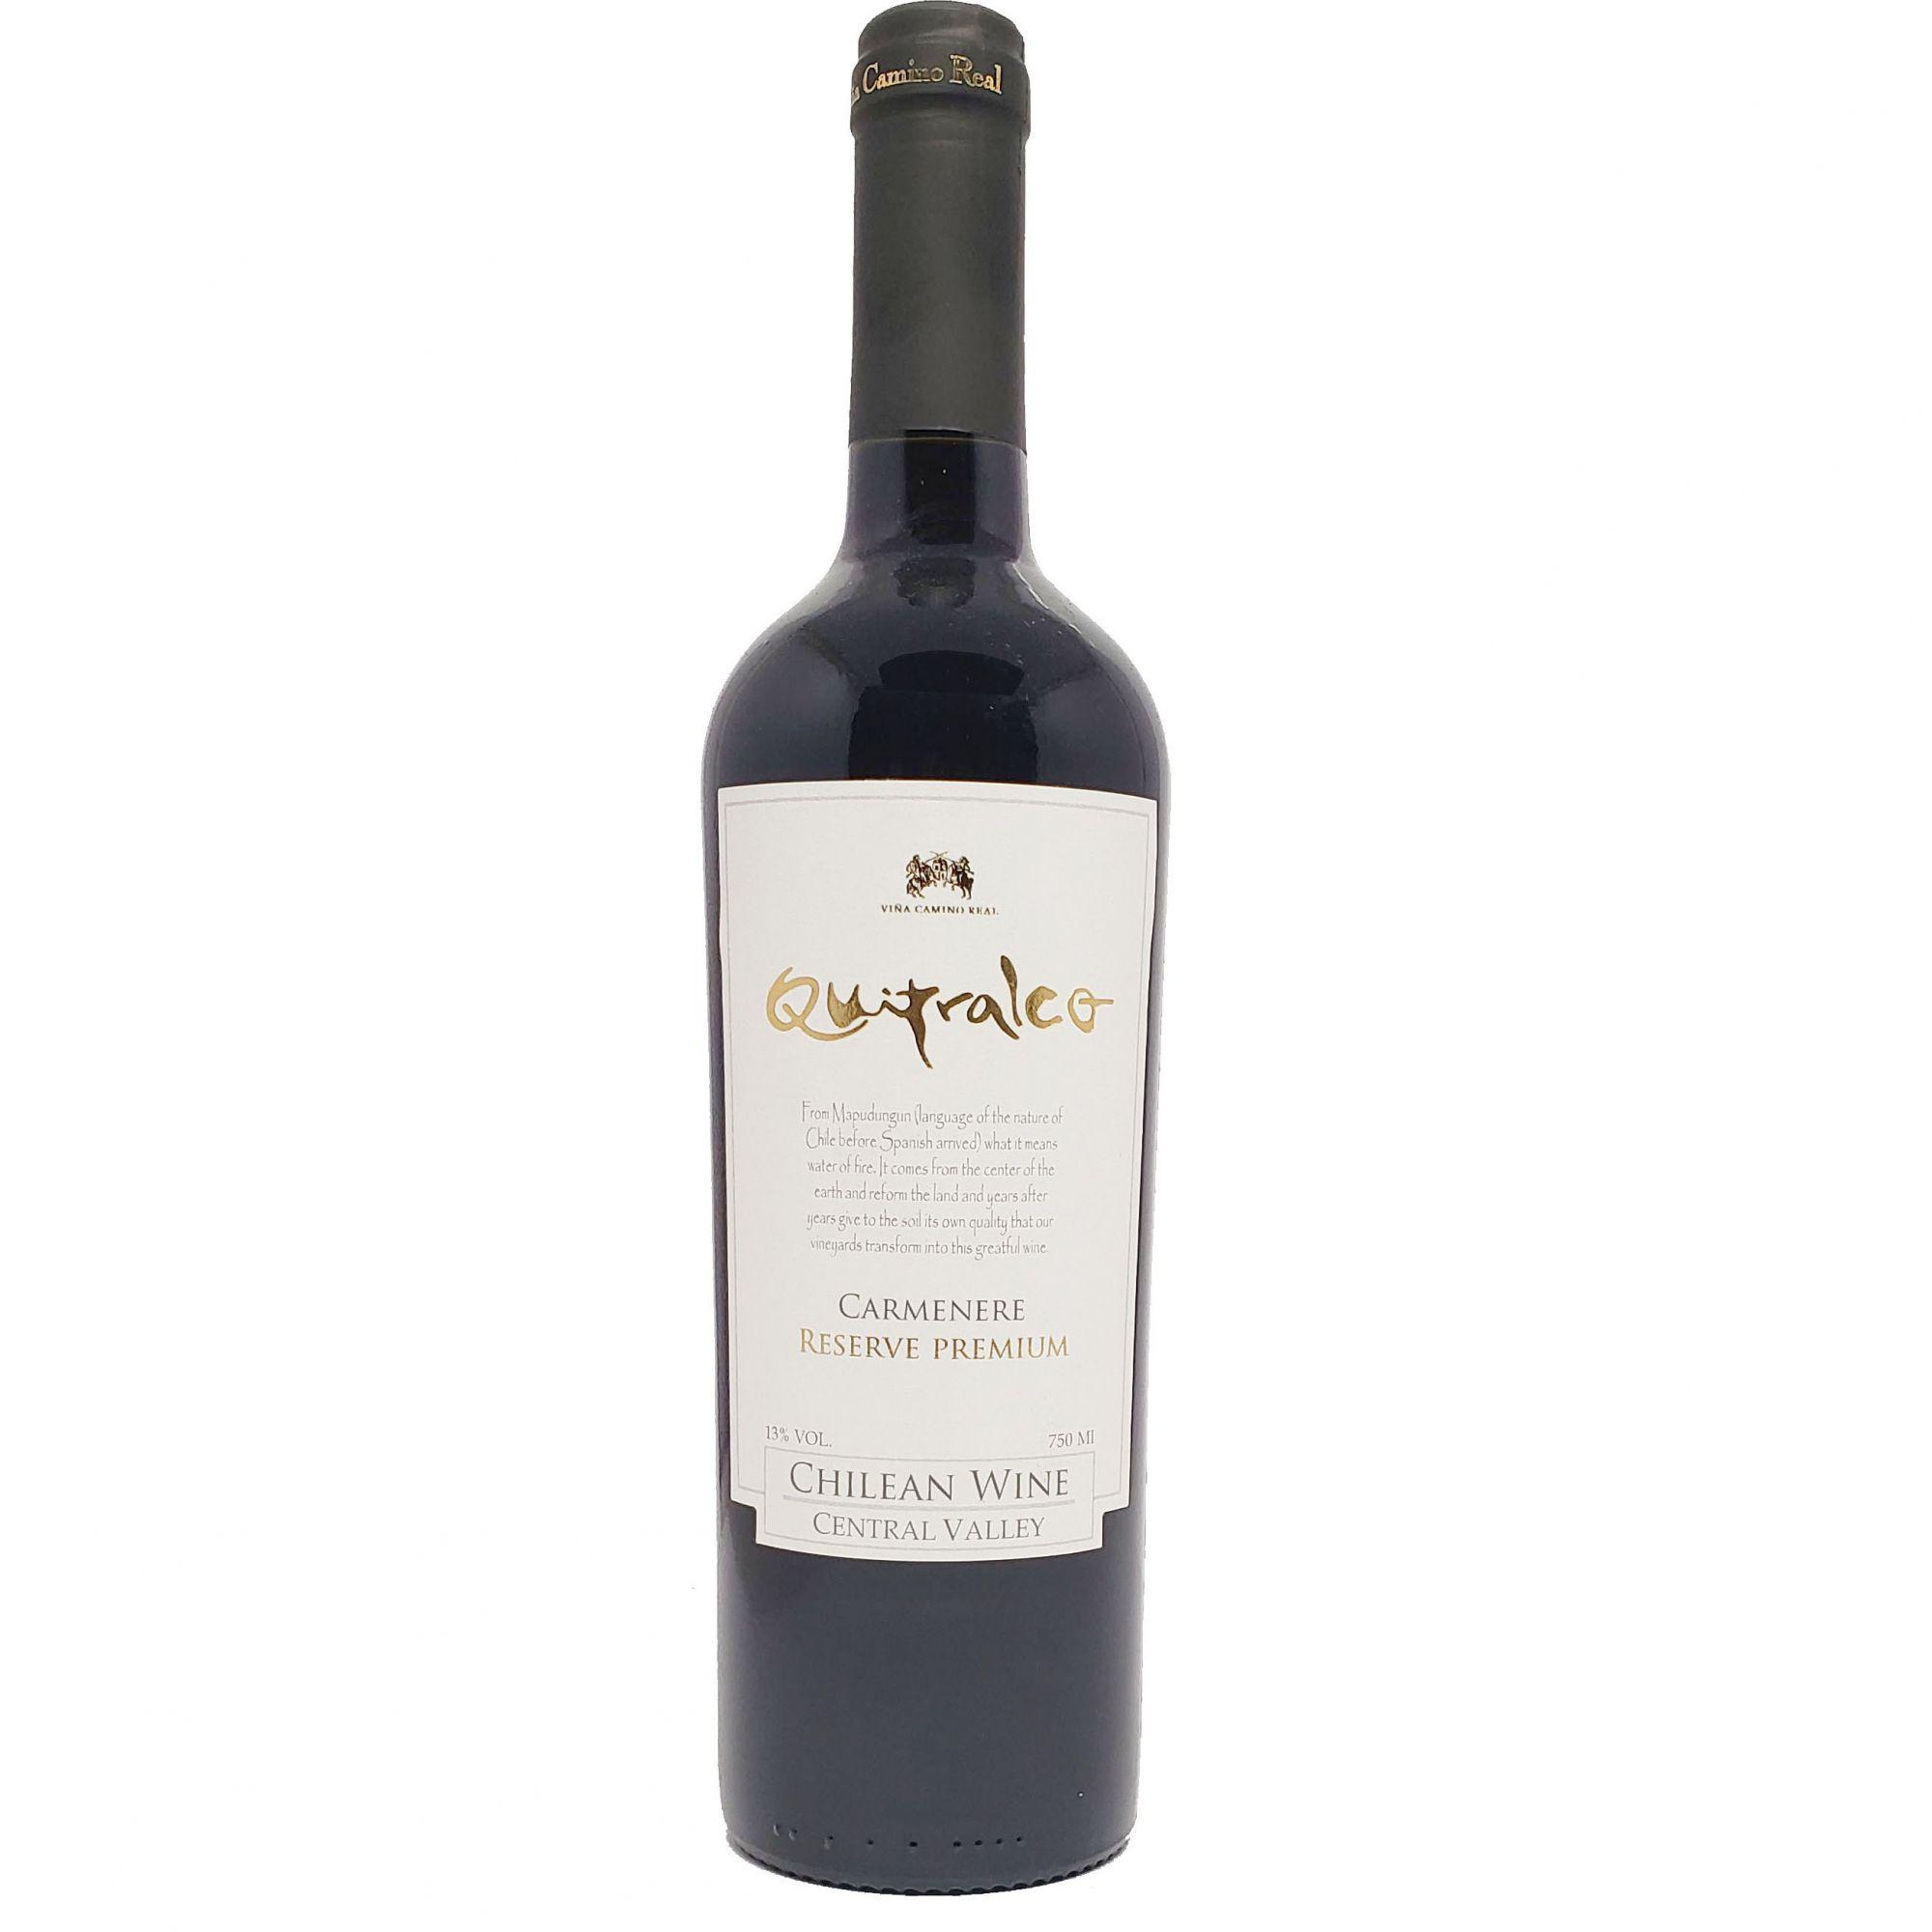 Vinho Tinto Quitralco Reserva Premium Carménère - 750ml -